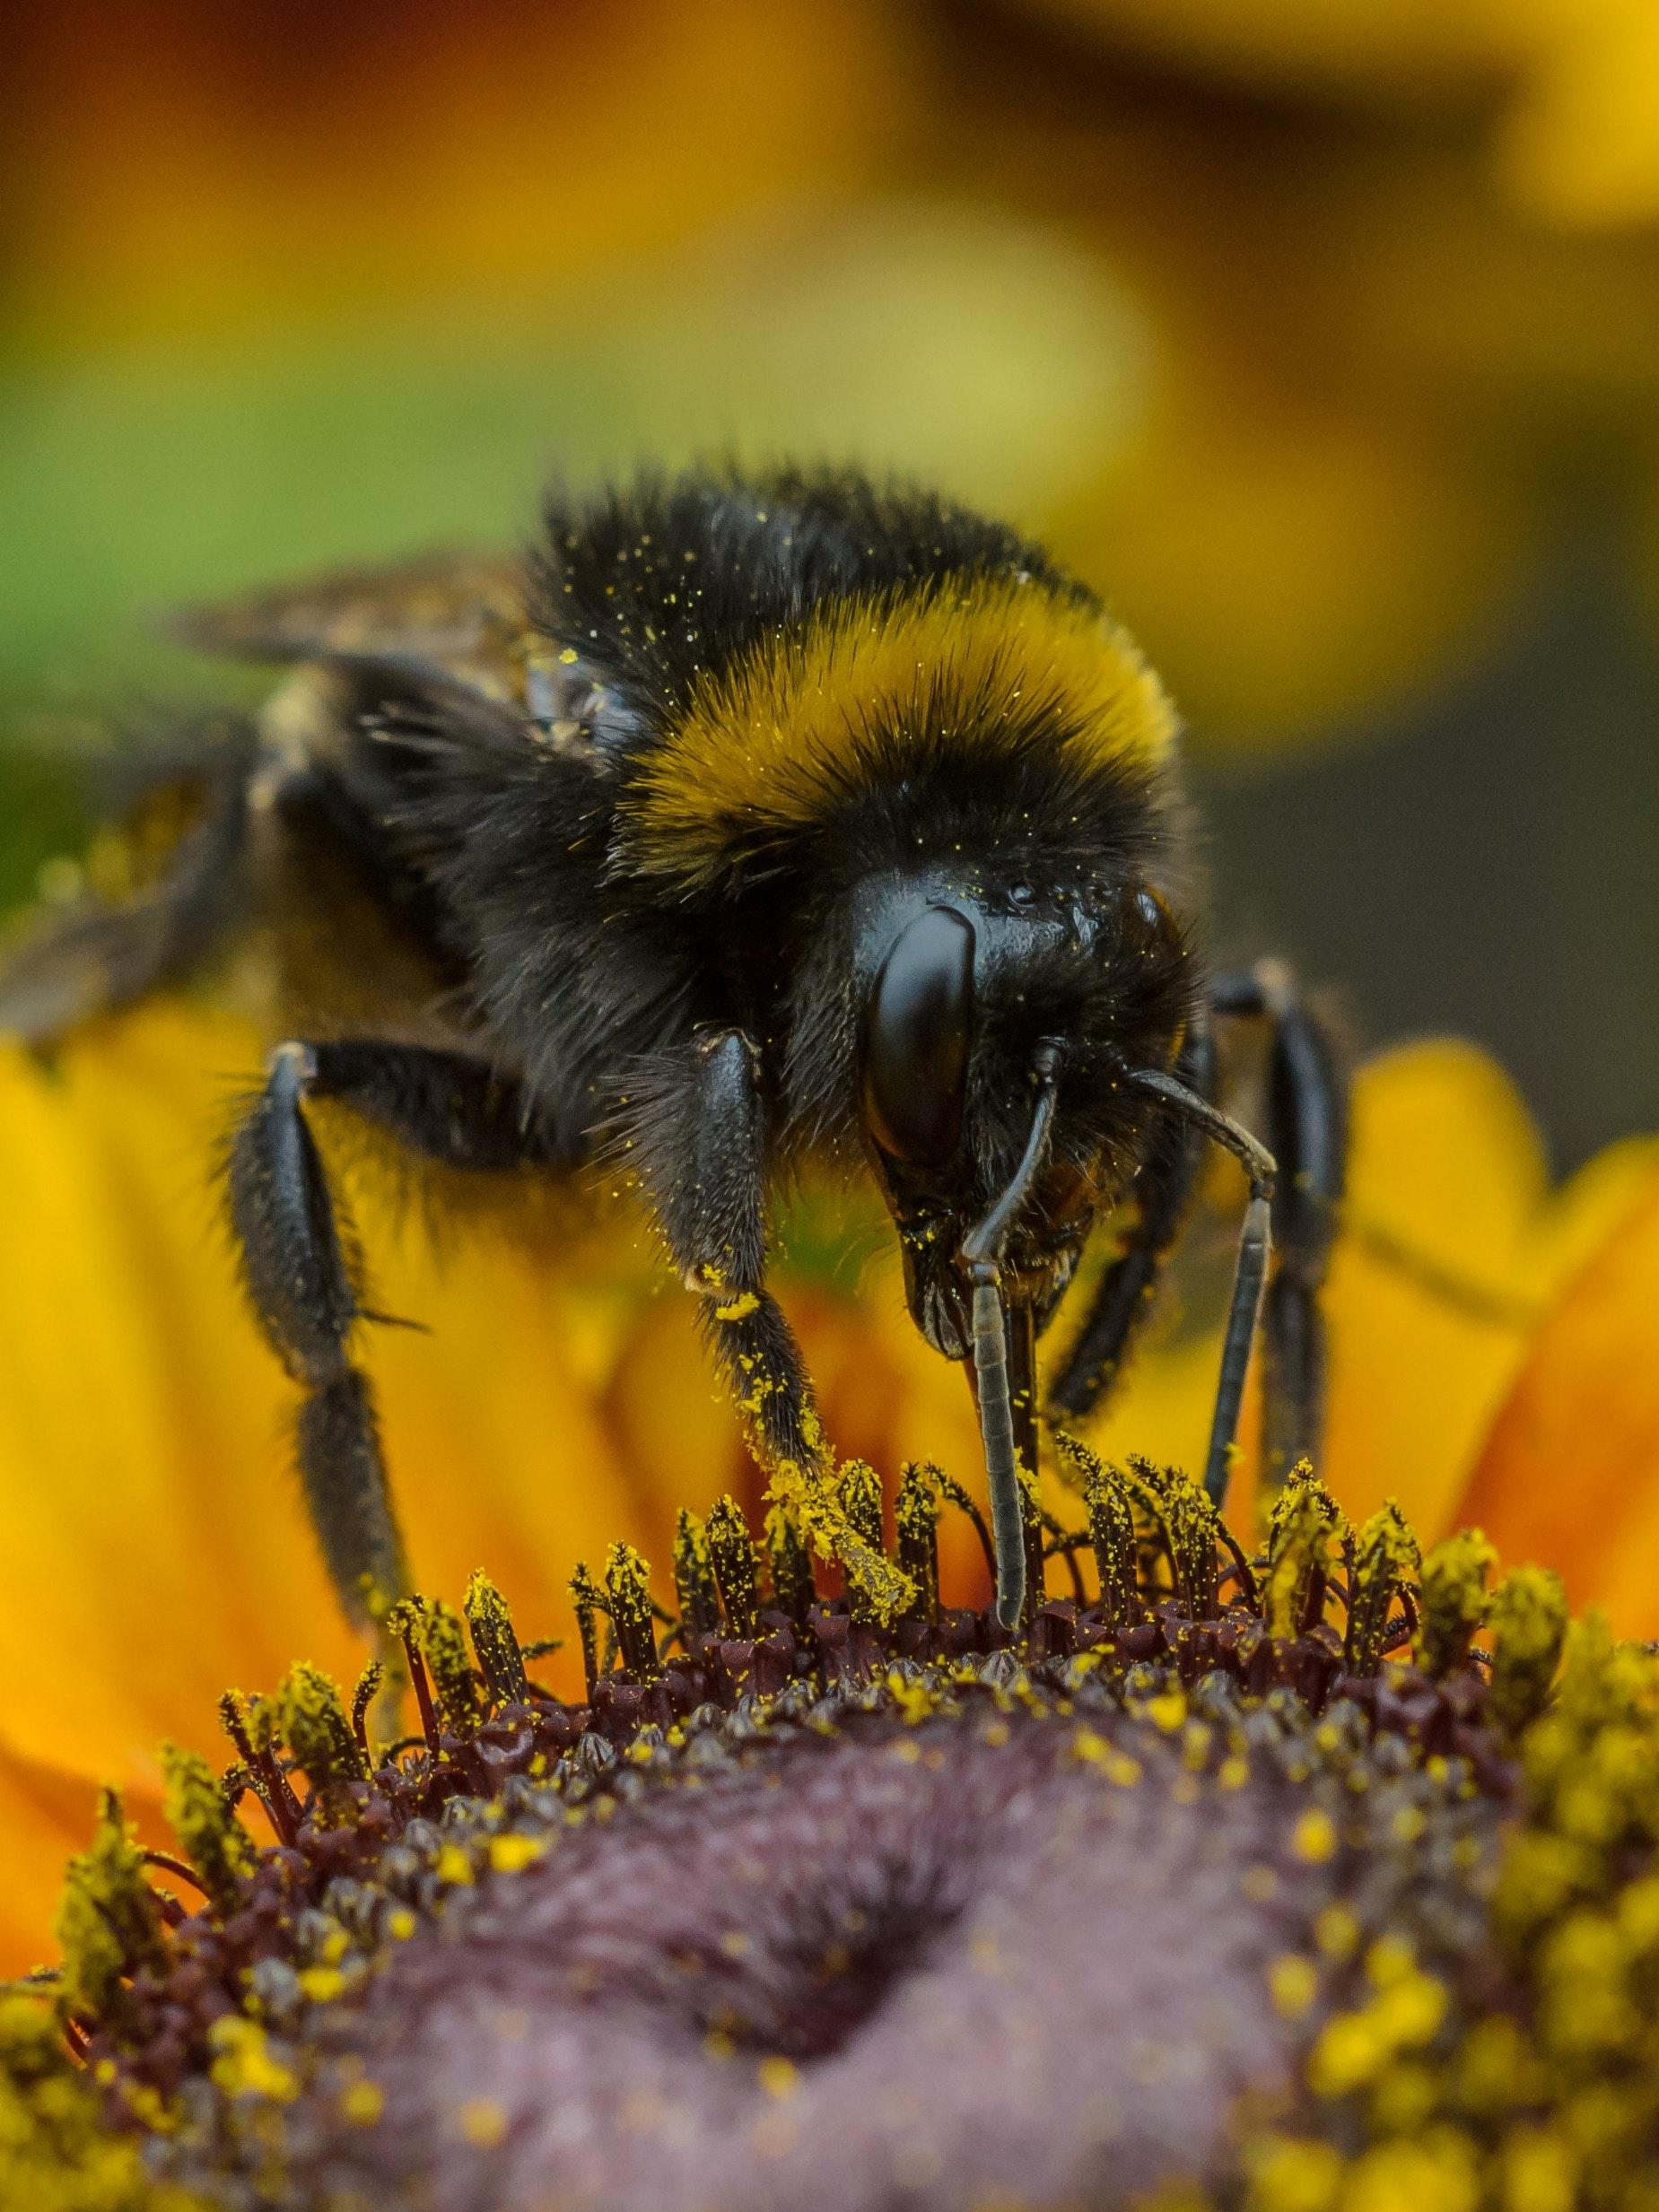 The $11 Billion California Almond Economy Relies on Honey Bees to Thrive